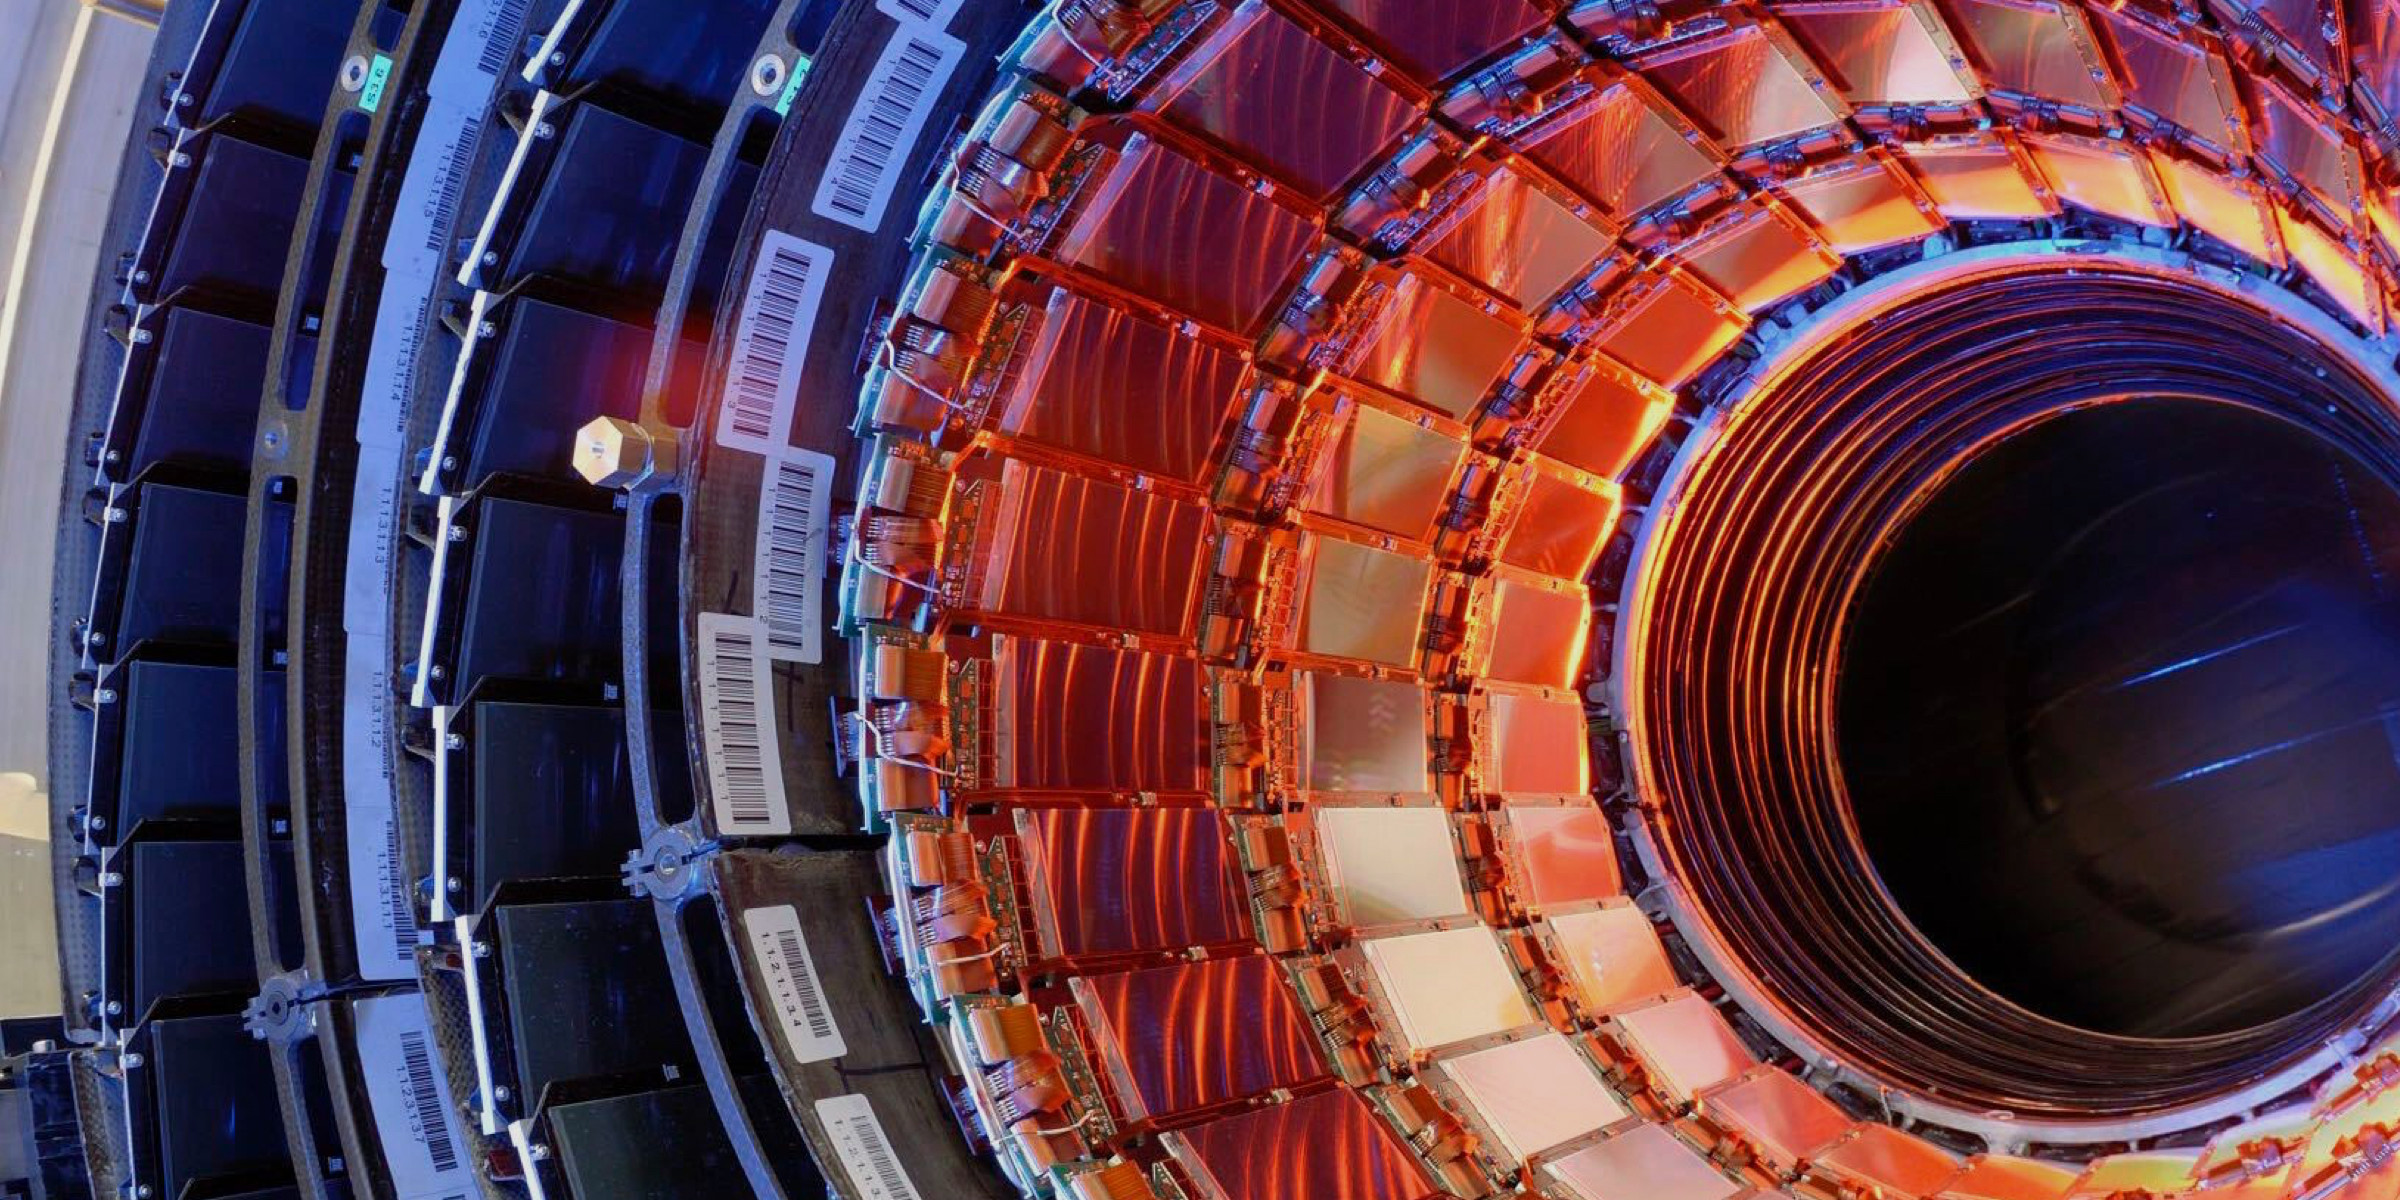 LHC-img